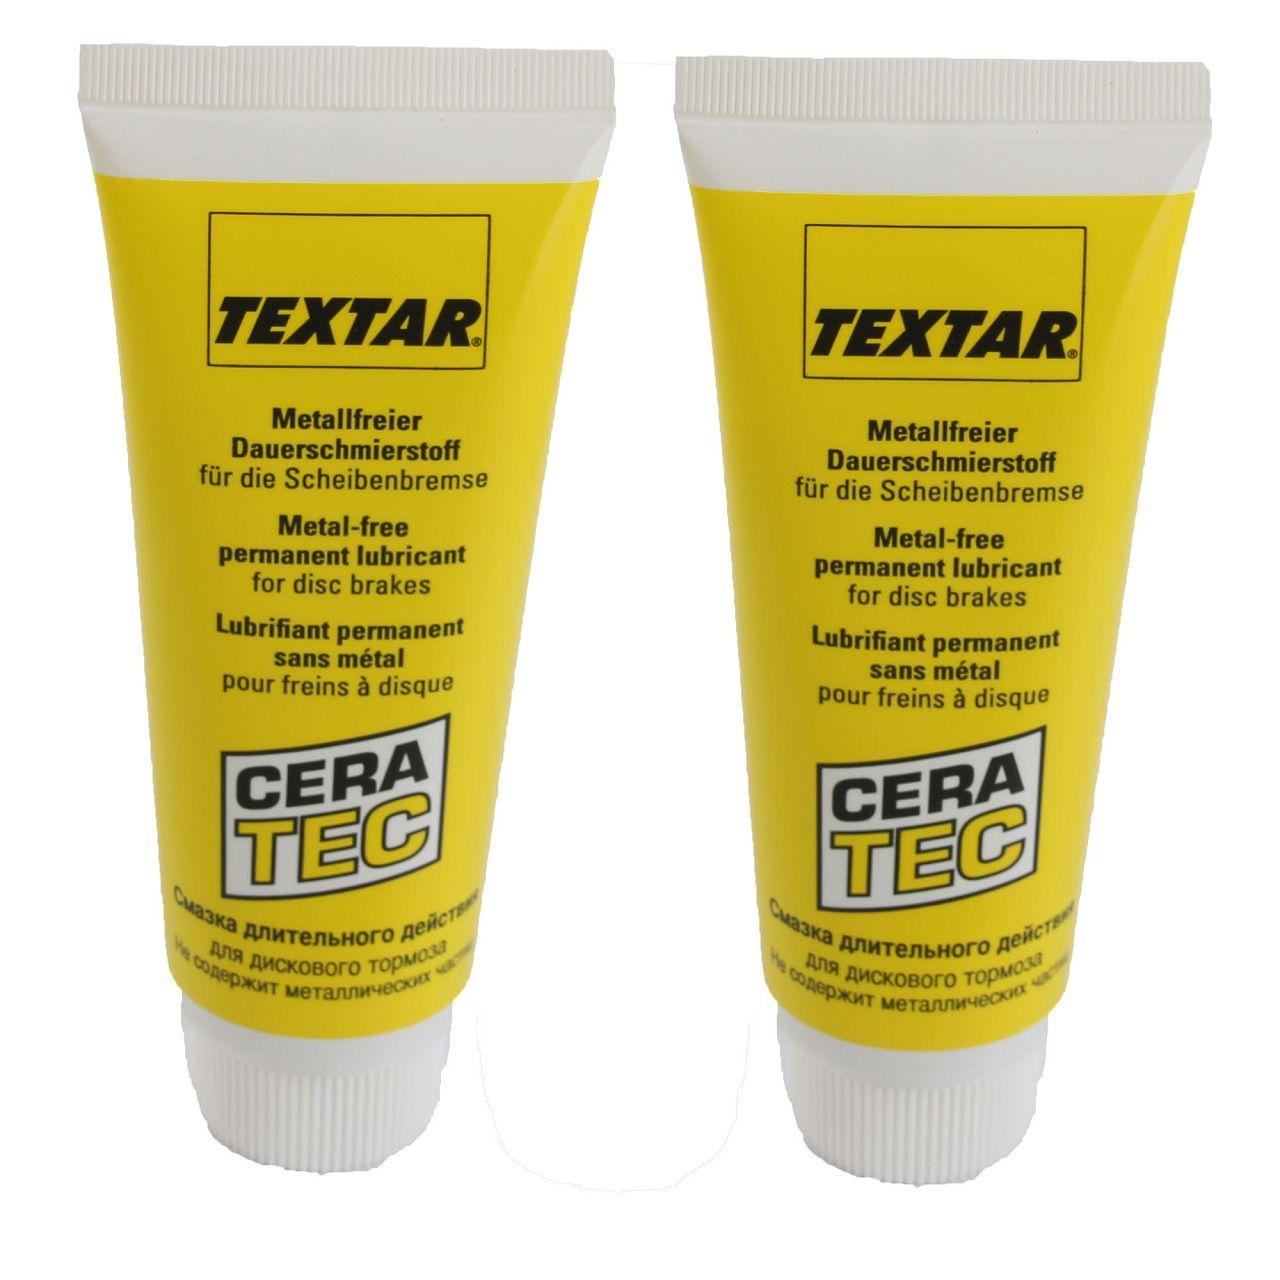 2x 75ml TEXTAR CeraTec Bremsklotzpaste Bremsbelagpaste Montagepaste